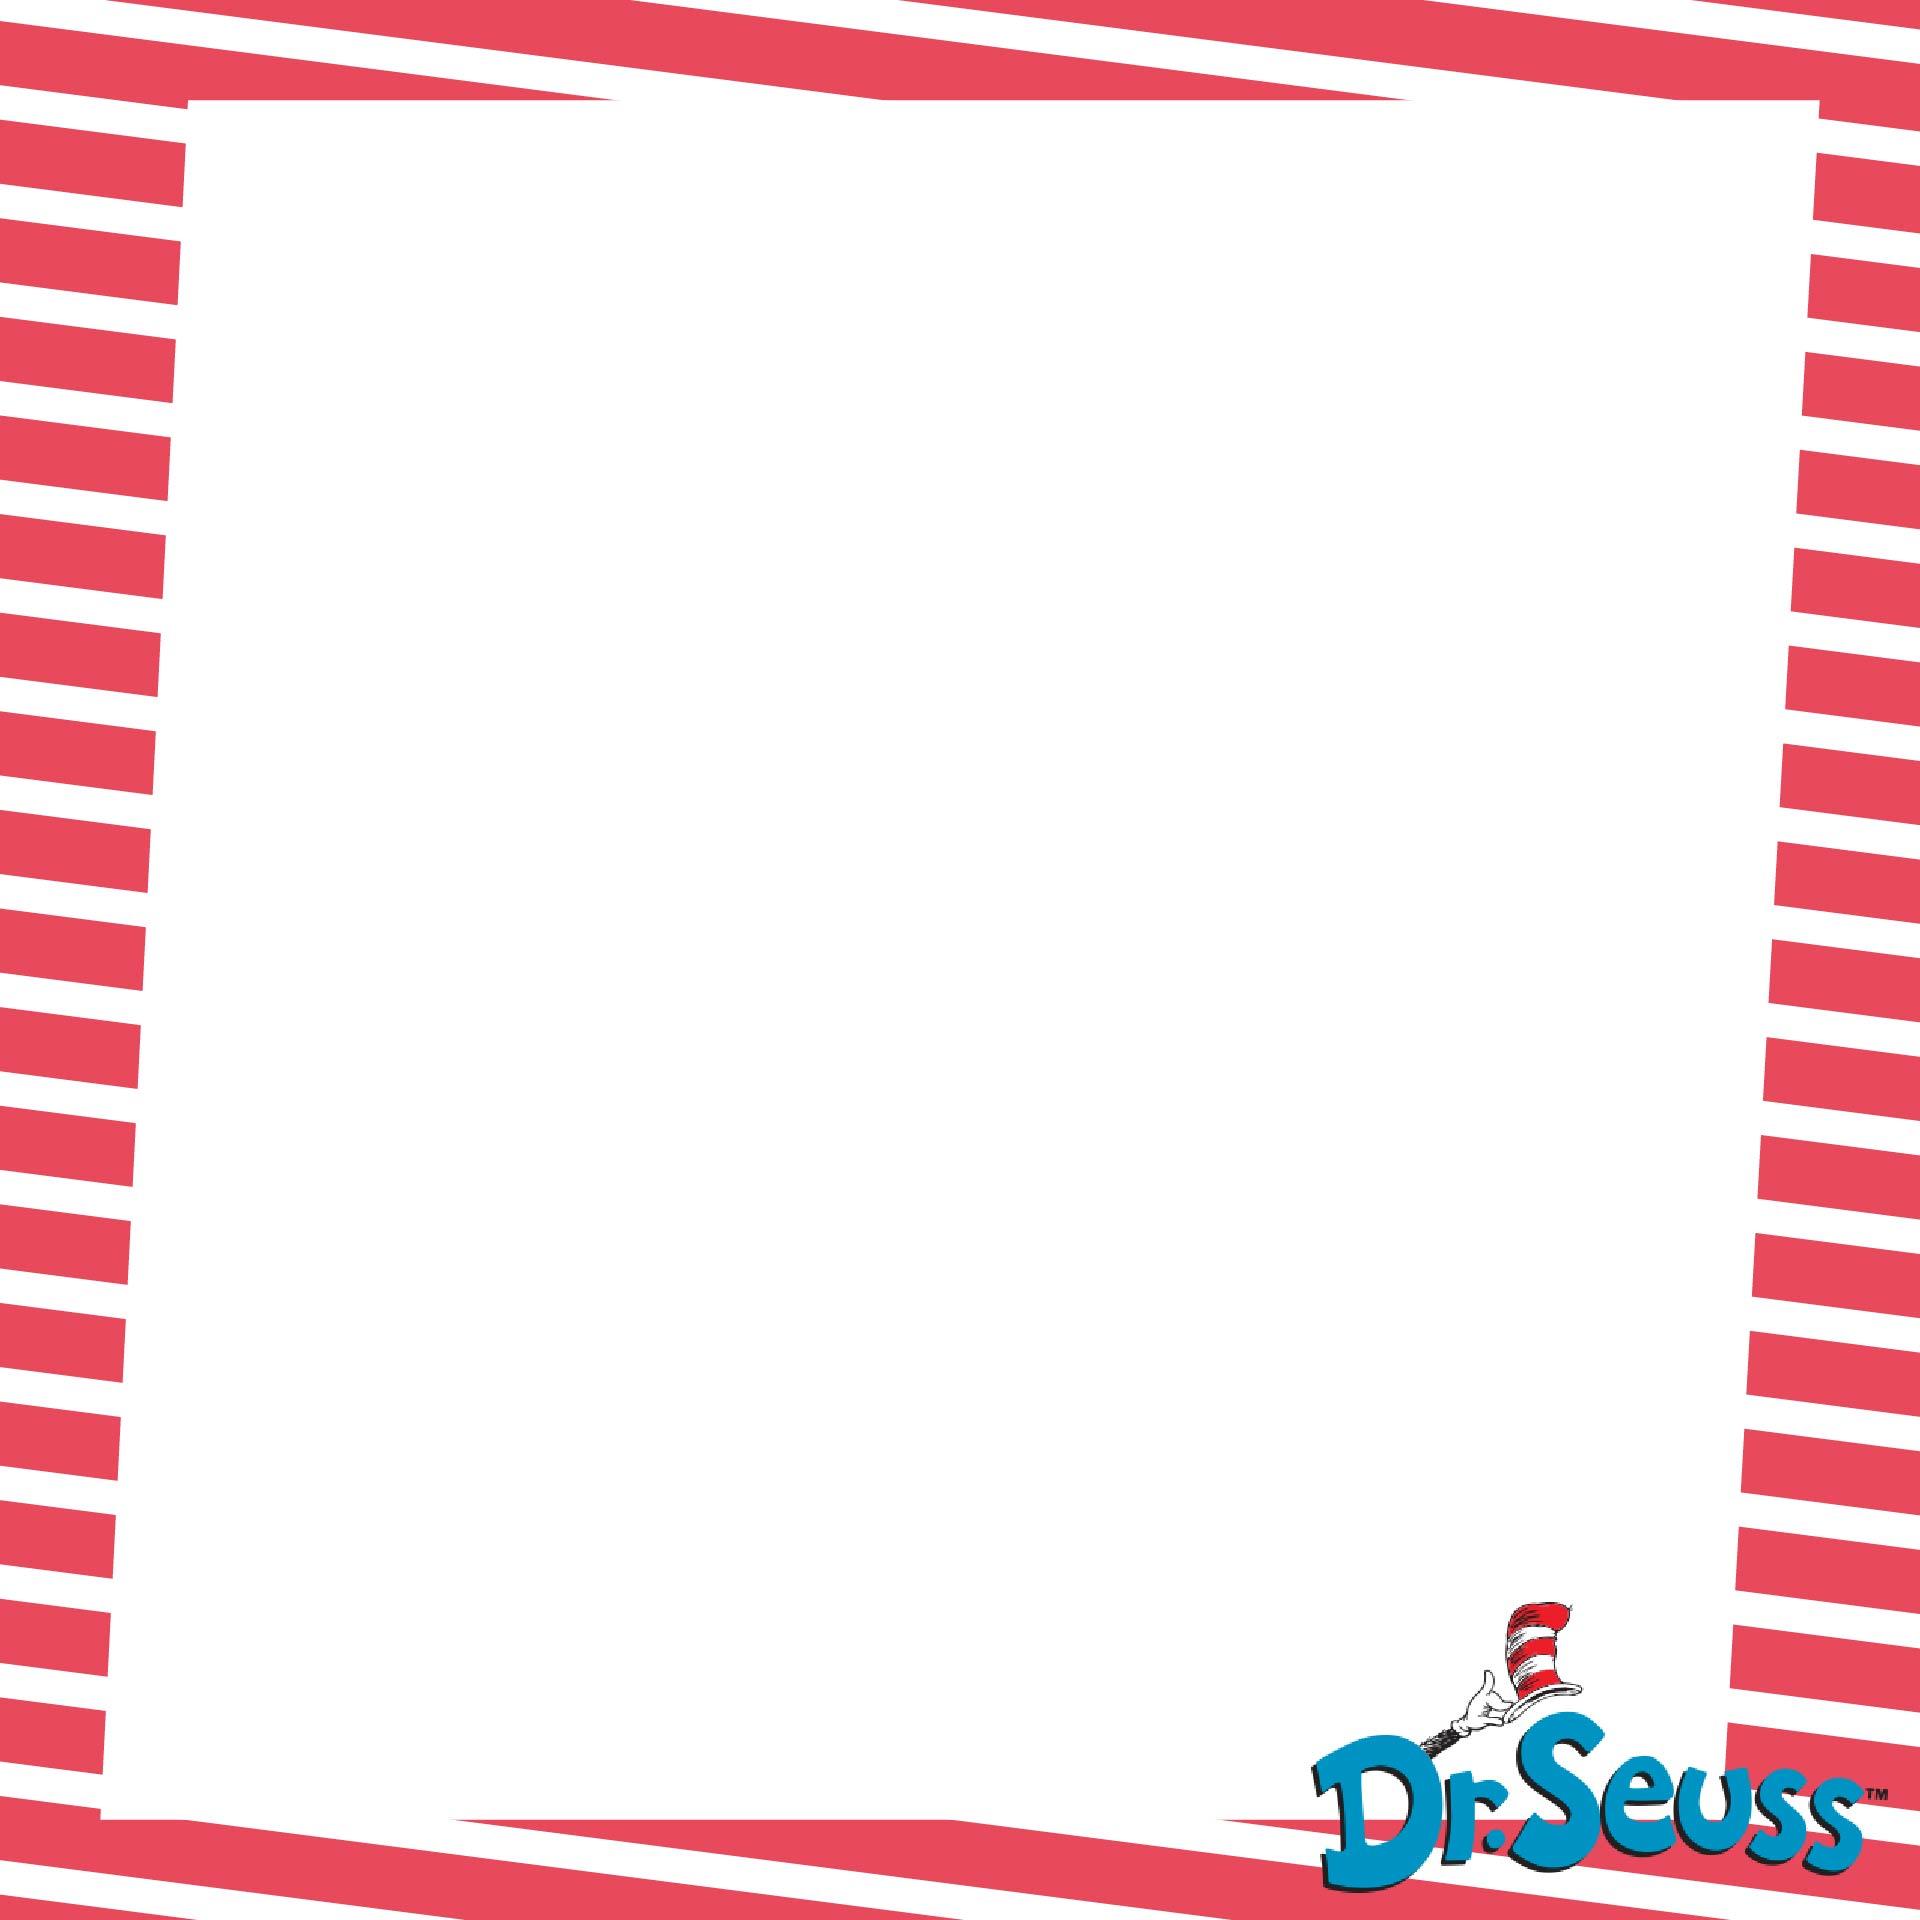 Dr. Seuss Printable Border Paper Free